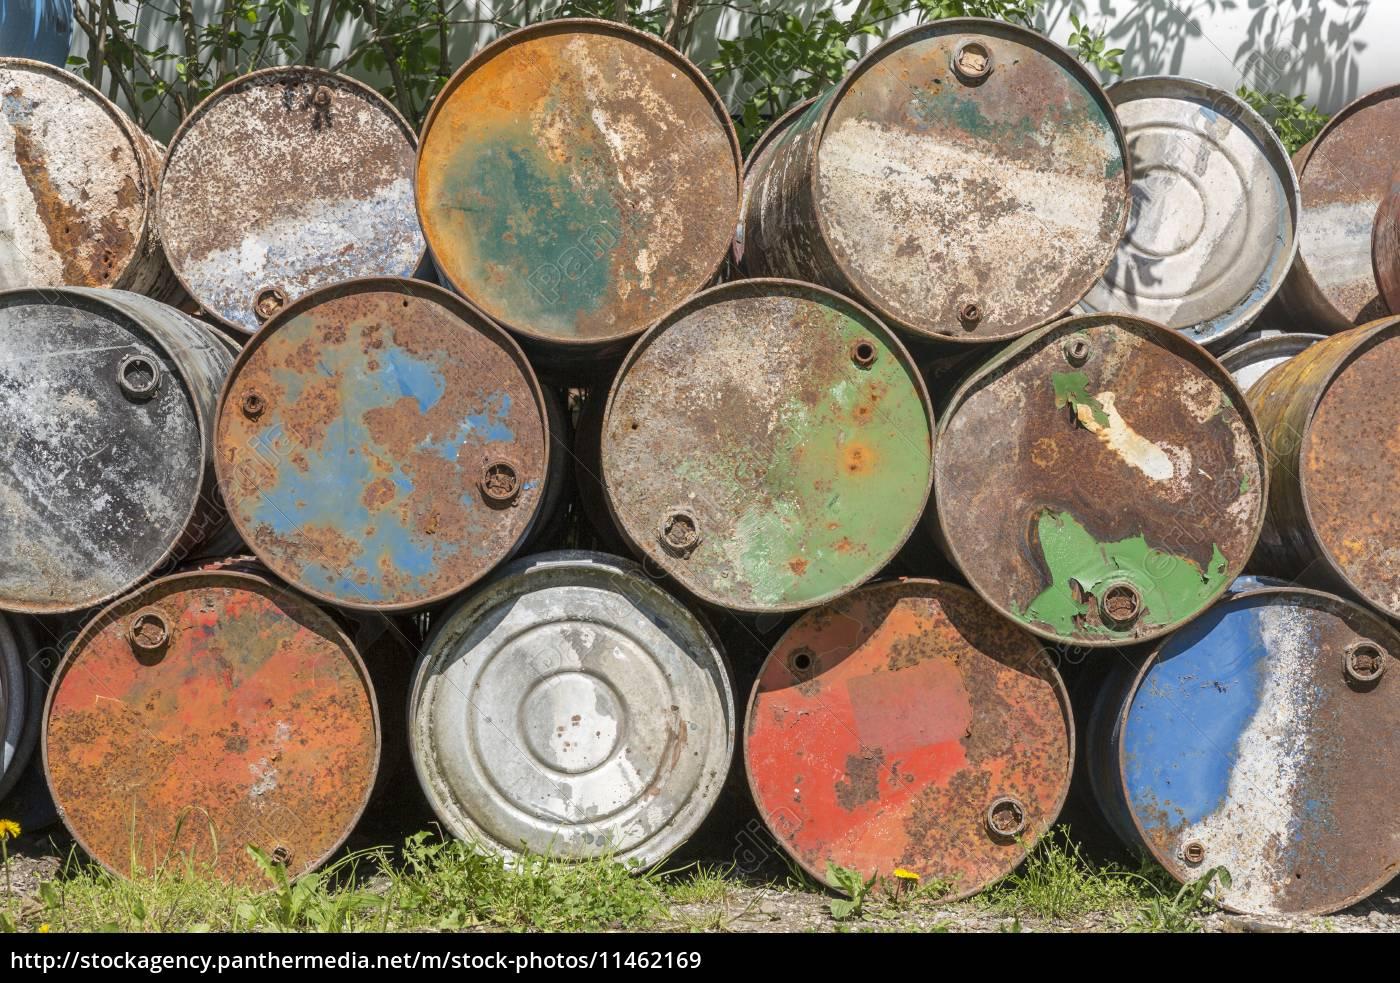 Super Leere Ölfässer, rostig und verwittert - Stockfoto - #11462169 &OV_82